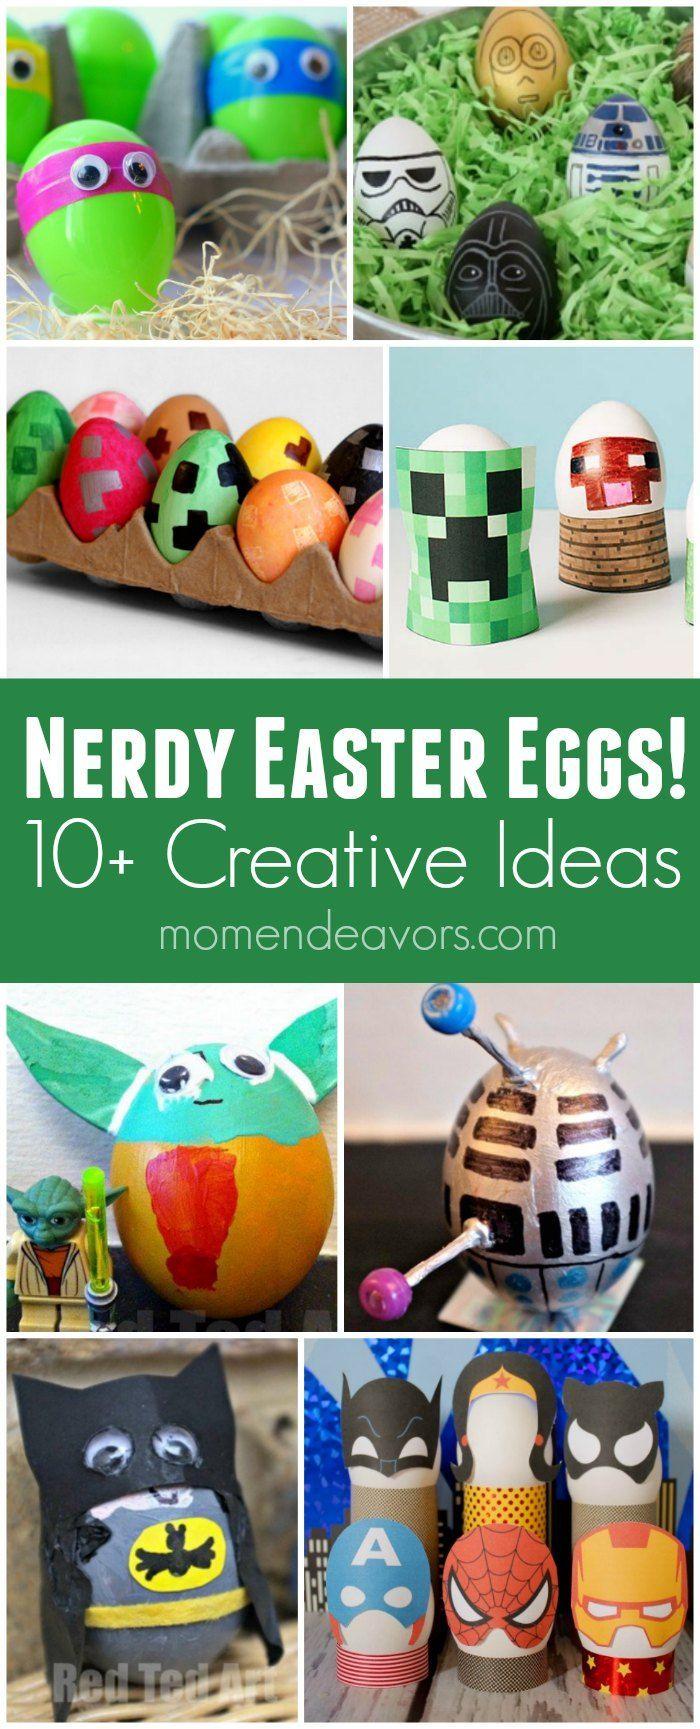 10+ Nerdy Easter Eggs - Creative egg ideas like Star Wars, Minecraft, Ninja Turtles, Avengers, and more!